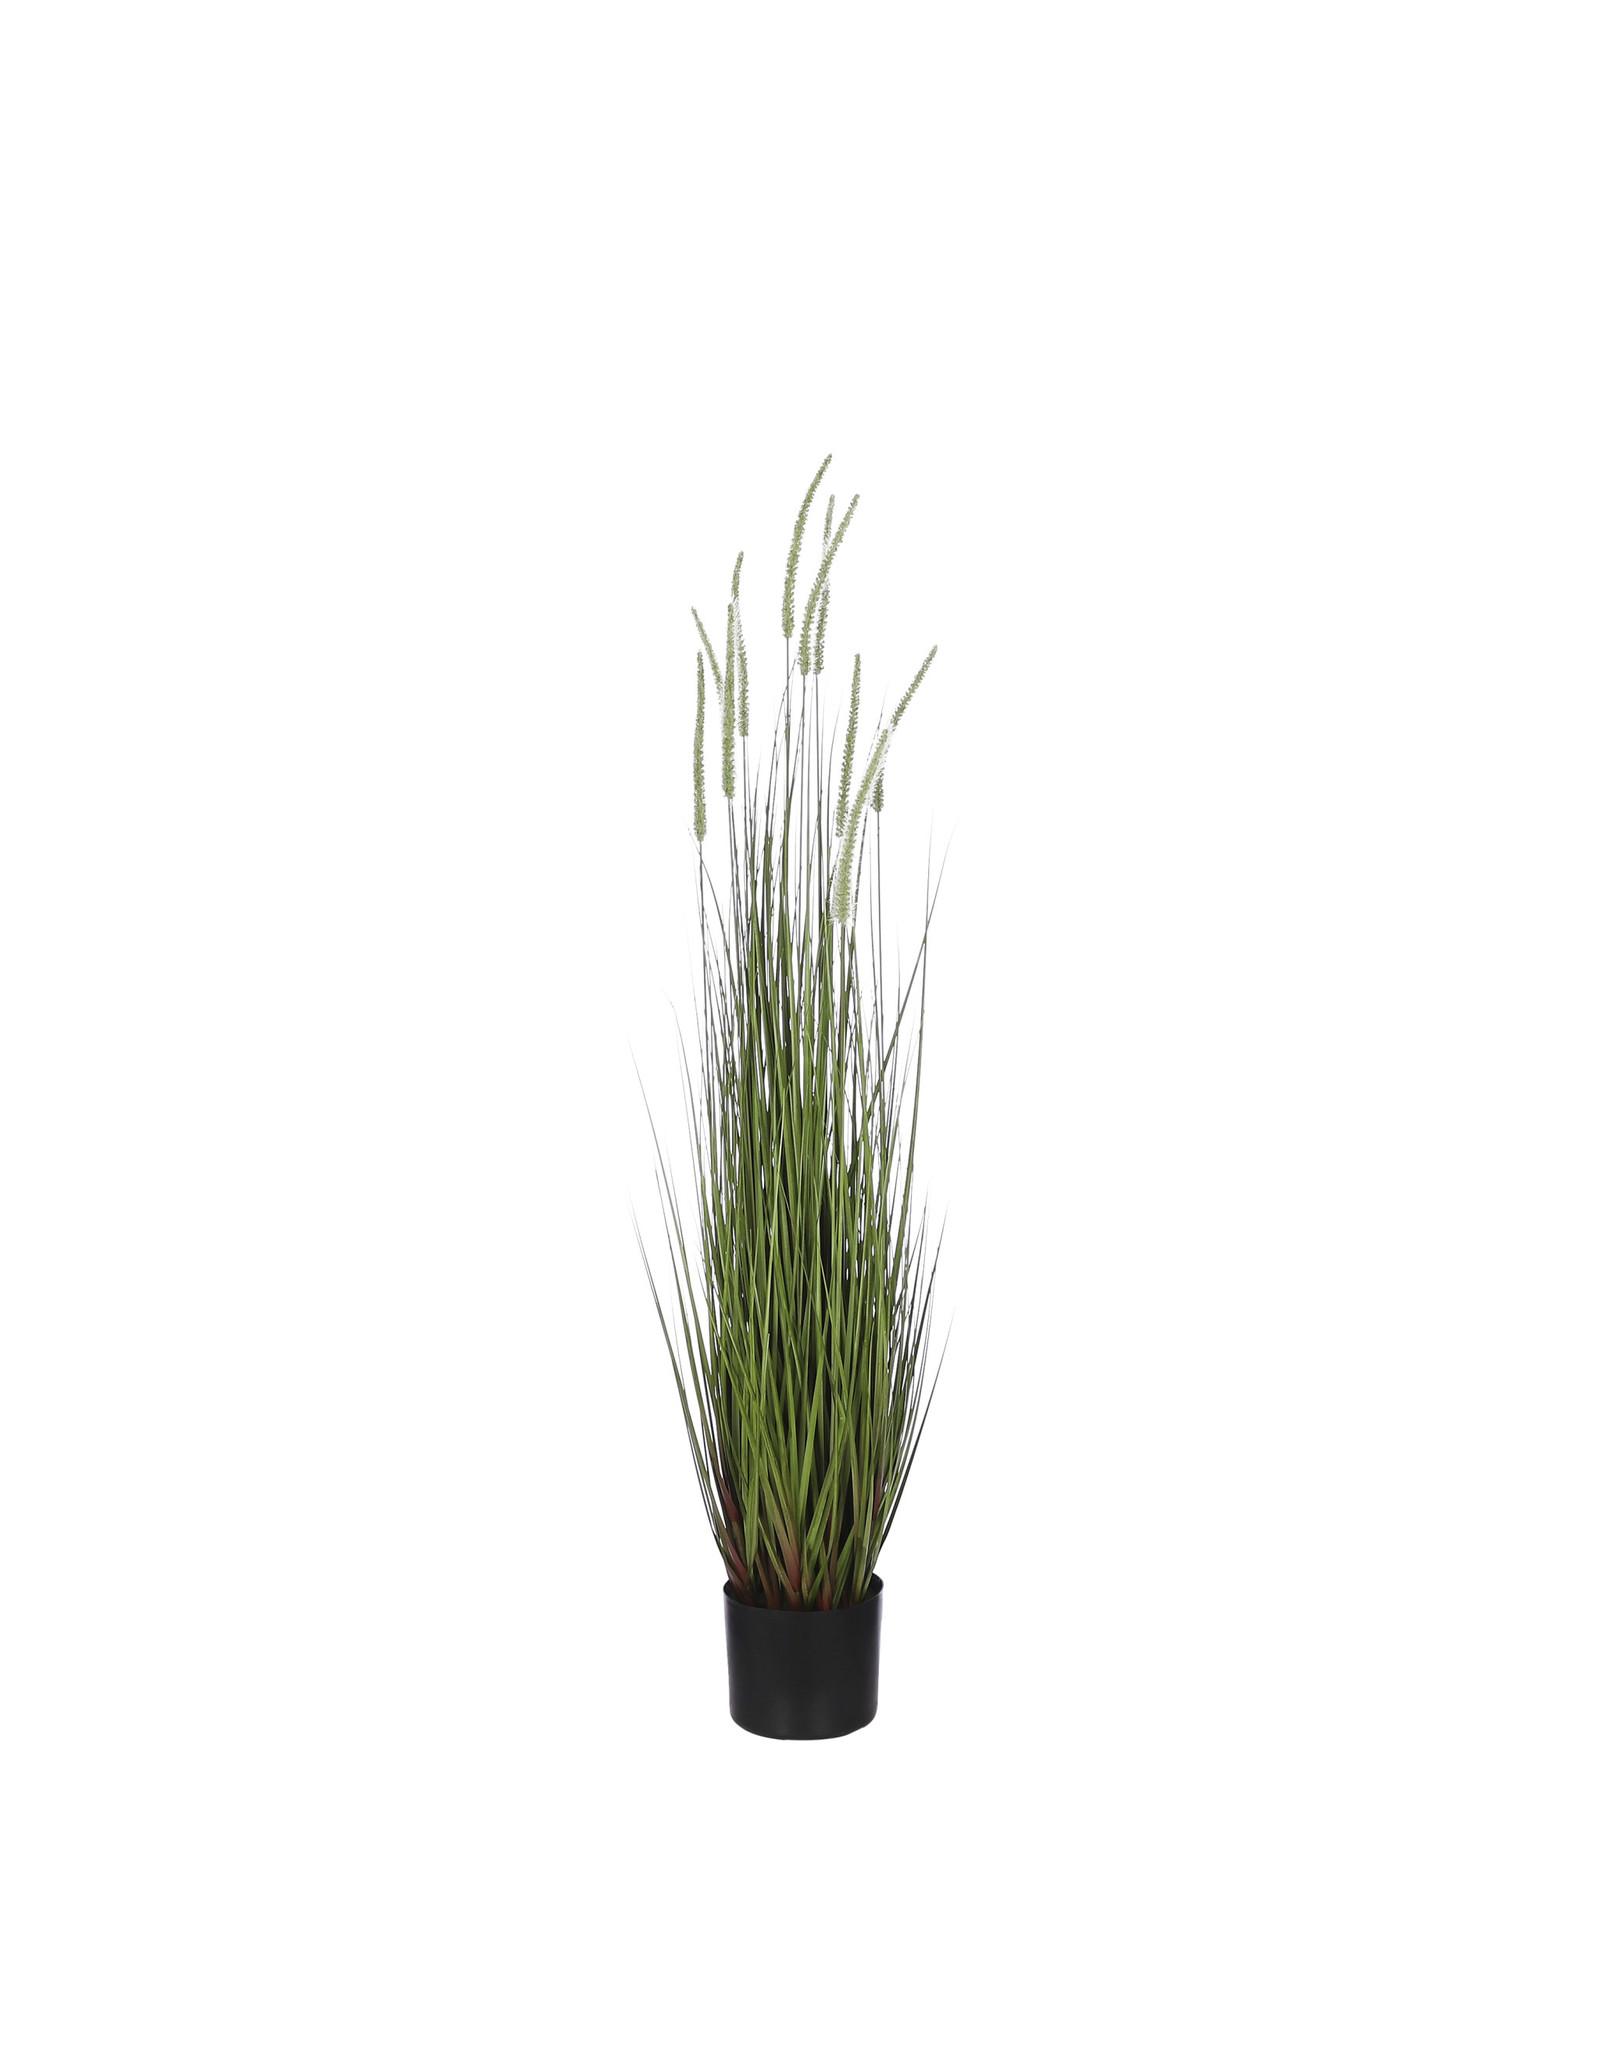 Mica Dogtail Grass Green in Pot